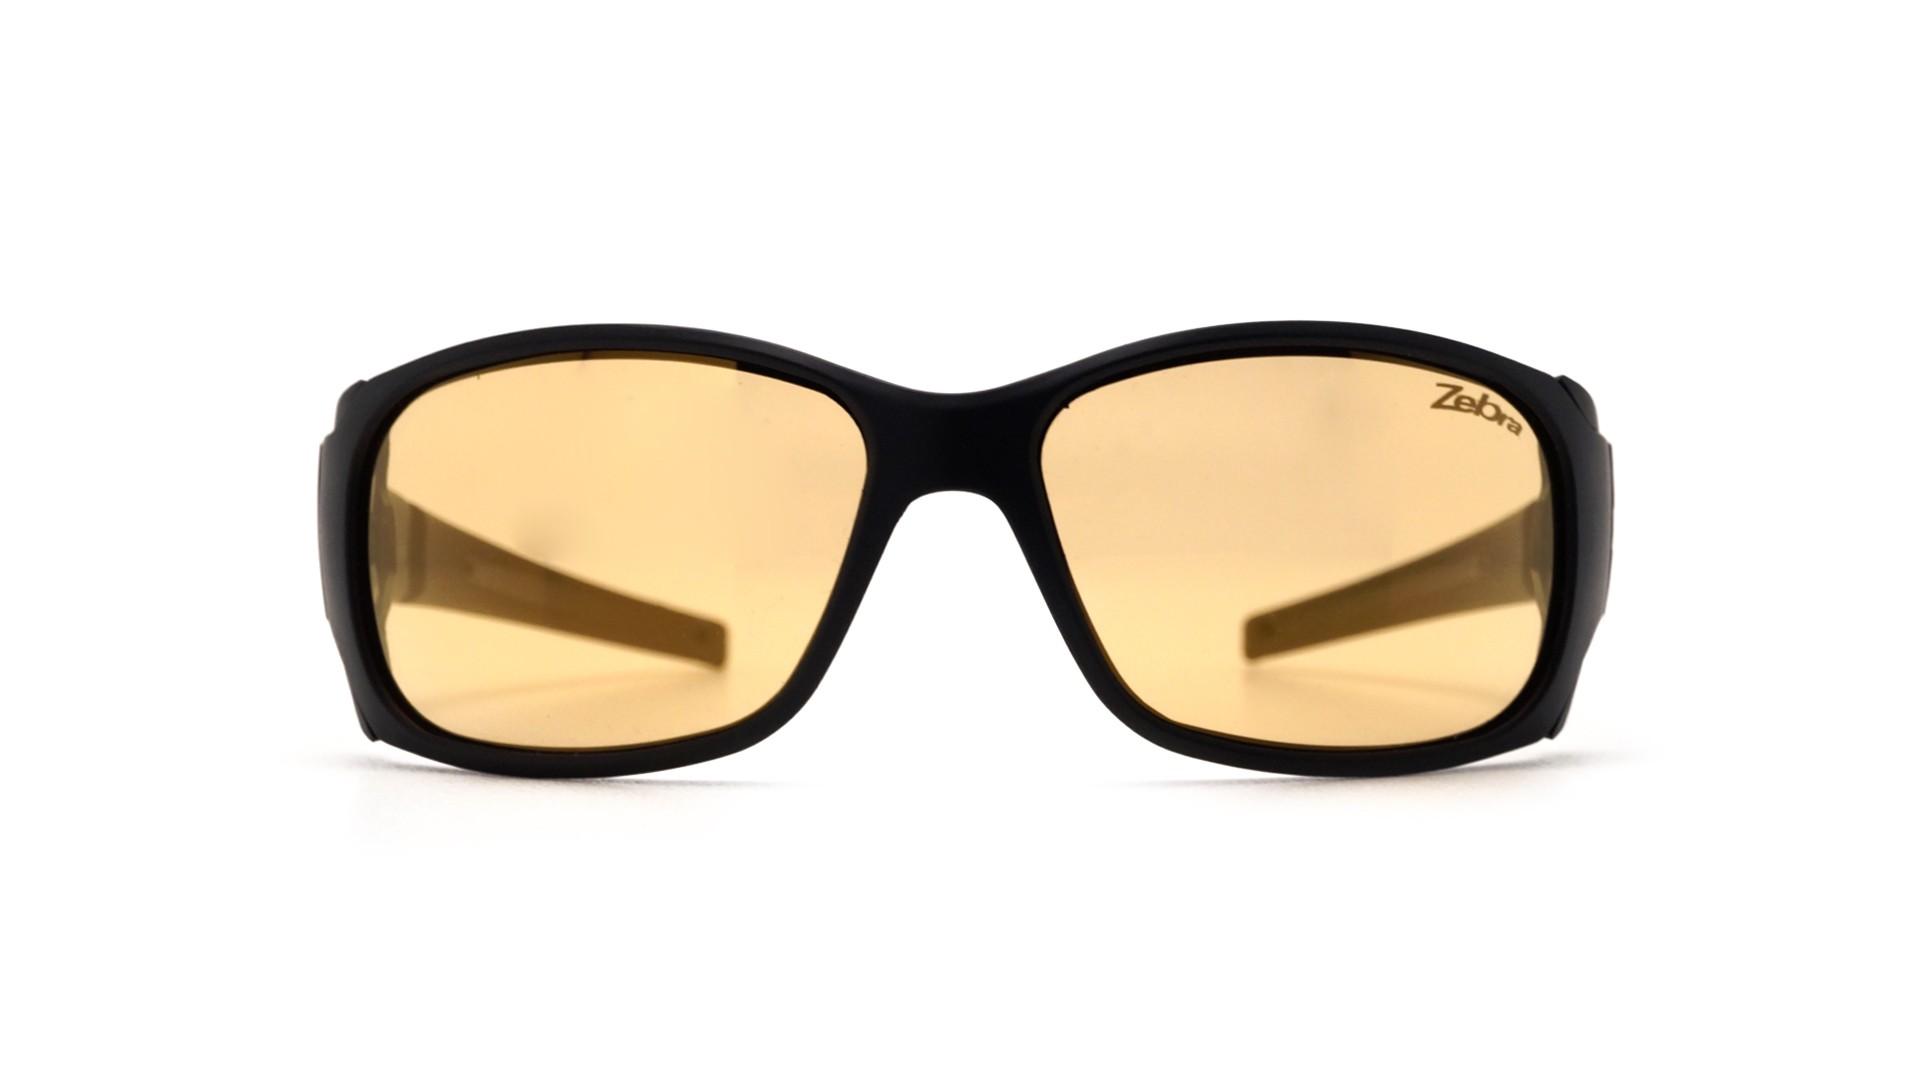 5328ef2223a Sunglasses Julbo Monterosa Black Matte J401 3122 58-15 Medium Photochromic  Mirror